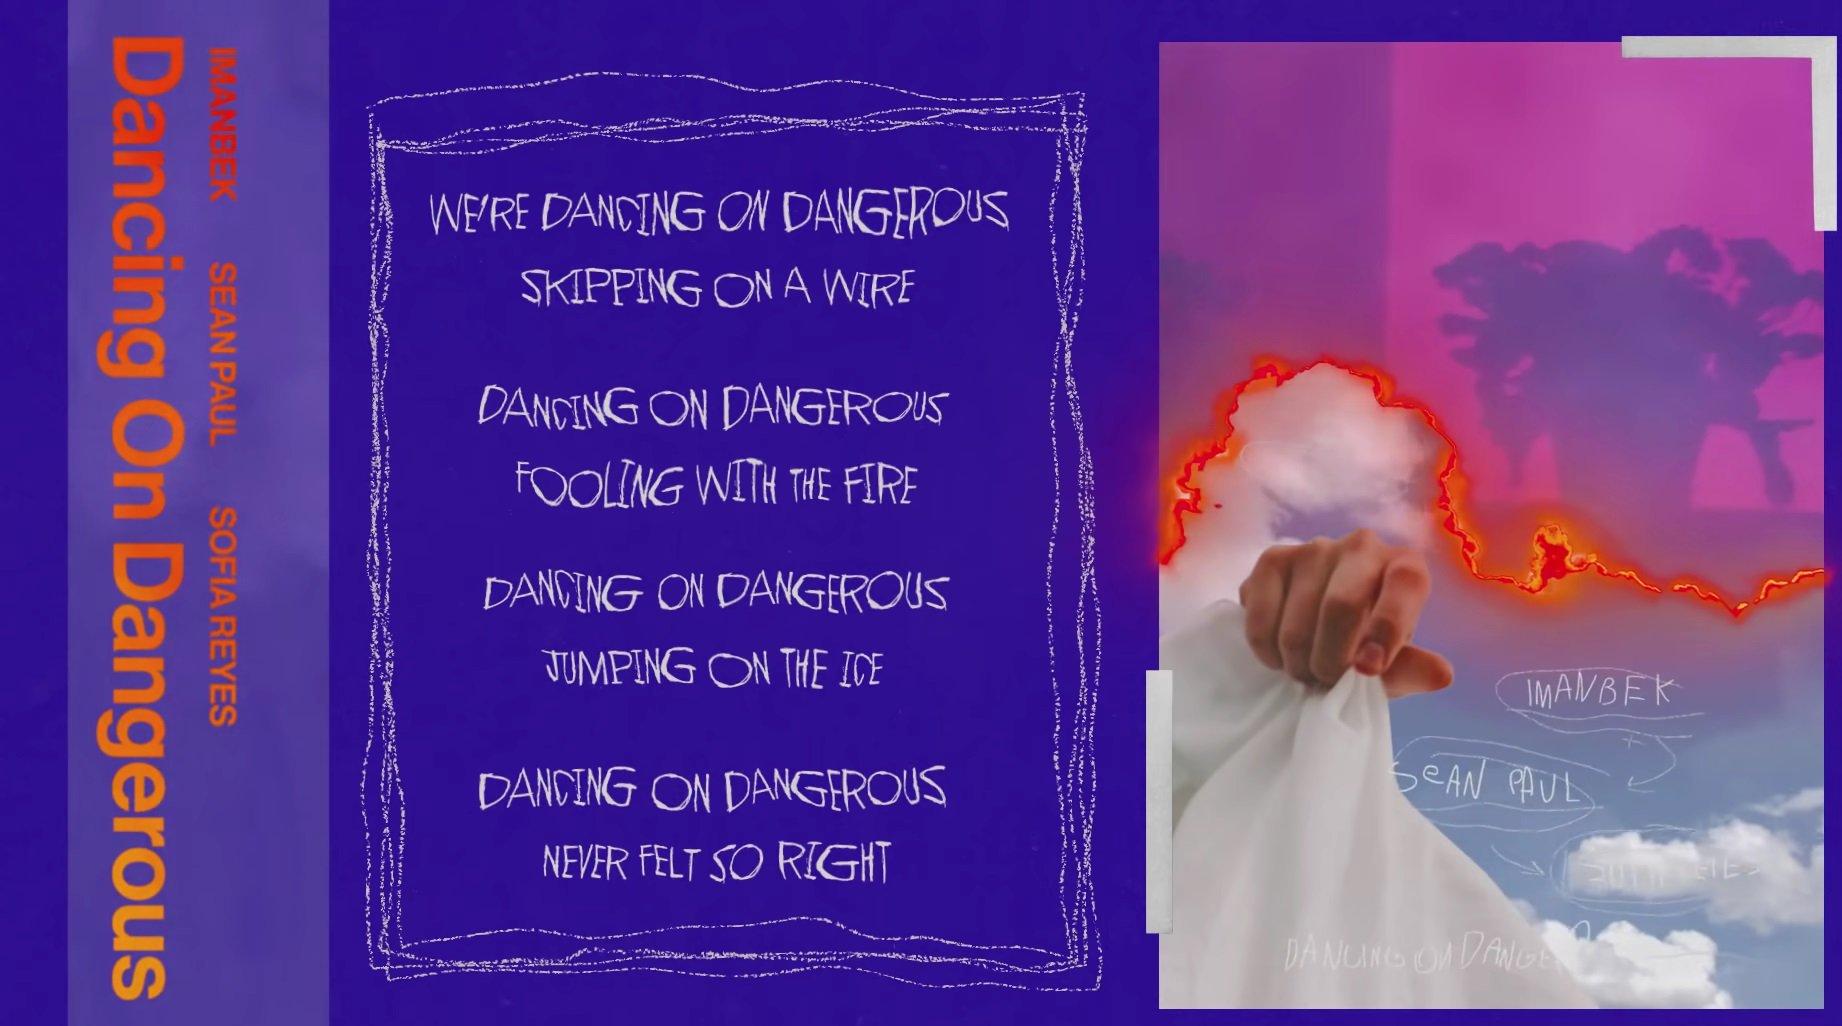 Imanbek Sean Paul Dancing On Dangerous Ft. Sofia Reyes